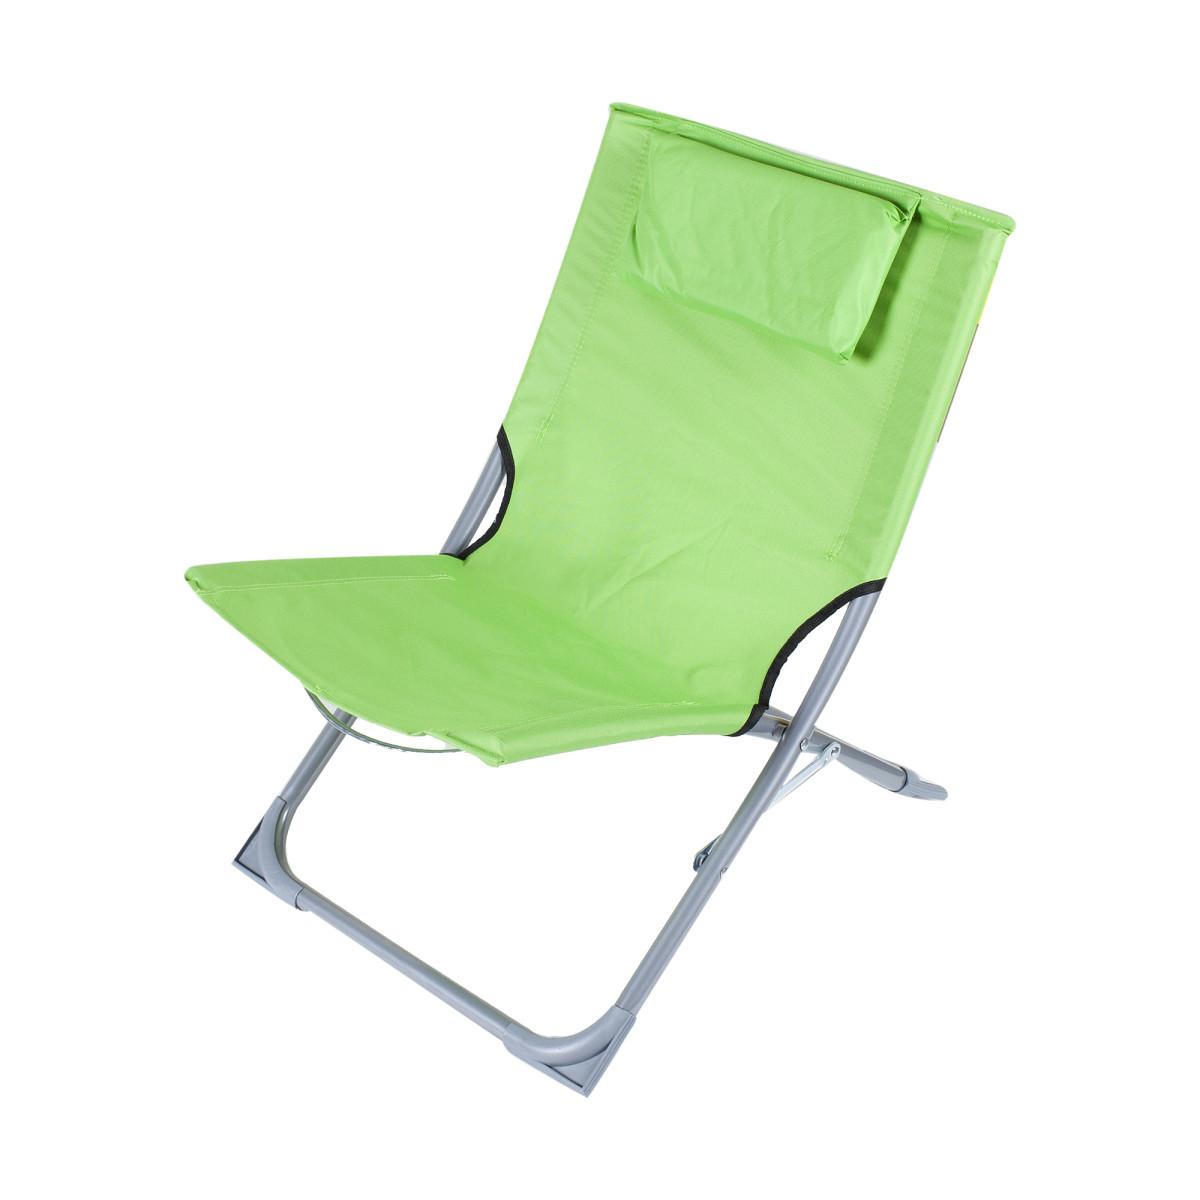 Стул пляжный зеленый 400x610x400 мм металл/ткань